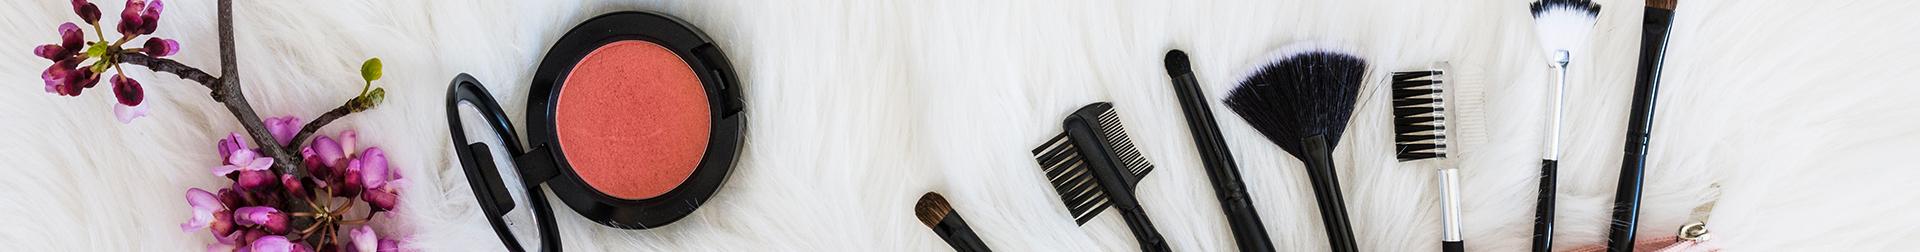 Makeup Tools & Accessories | Bye Makeup Tools, Beauty Tools & Makeup Accessories  | AromaCraze